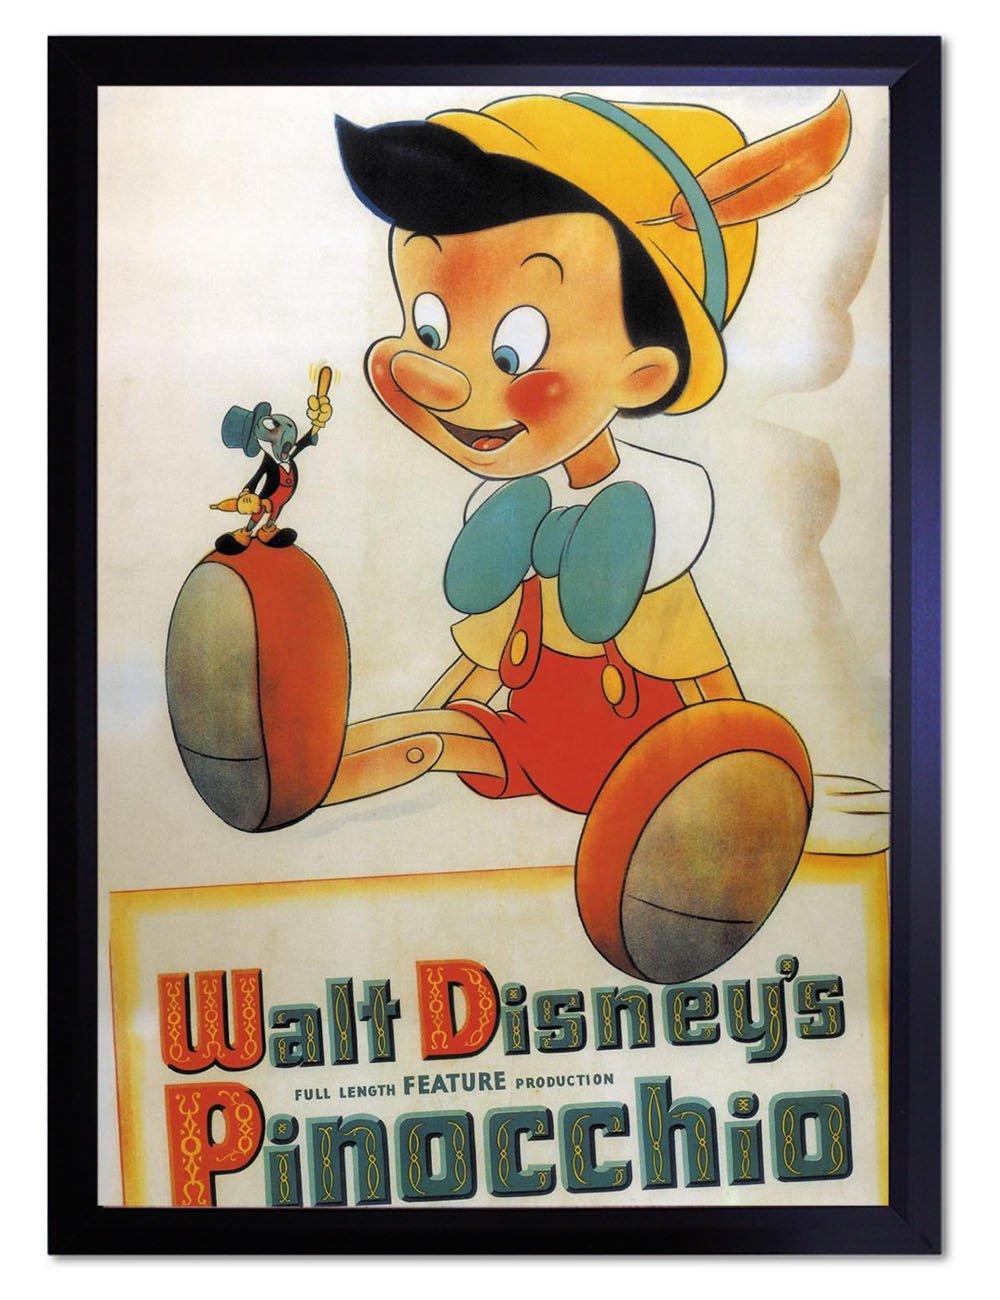 【DXポスター】ディズニーポスター Disney ピノキオ レトロP-A2-POP-DSNY-0022-wh P-A2-POP-DSNY-0022-wh B073SGTS3M A2サイズ(59.4cm×42cm)+ホワイトフレーム A2サイズ(59.4cm×42cm)+ホワイトフレーム